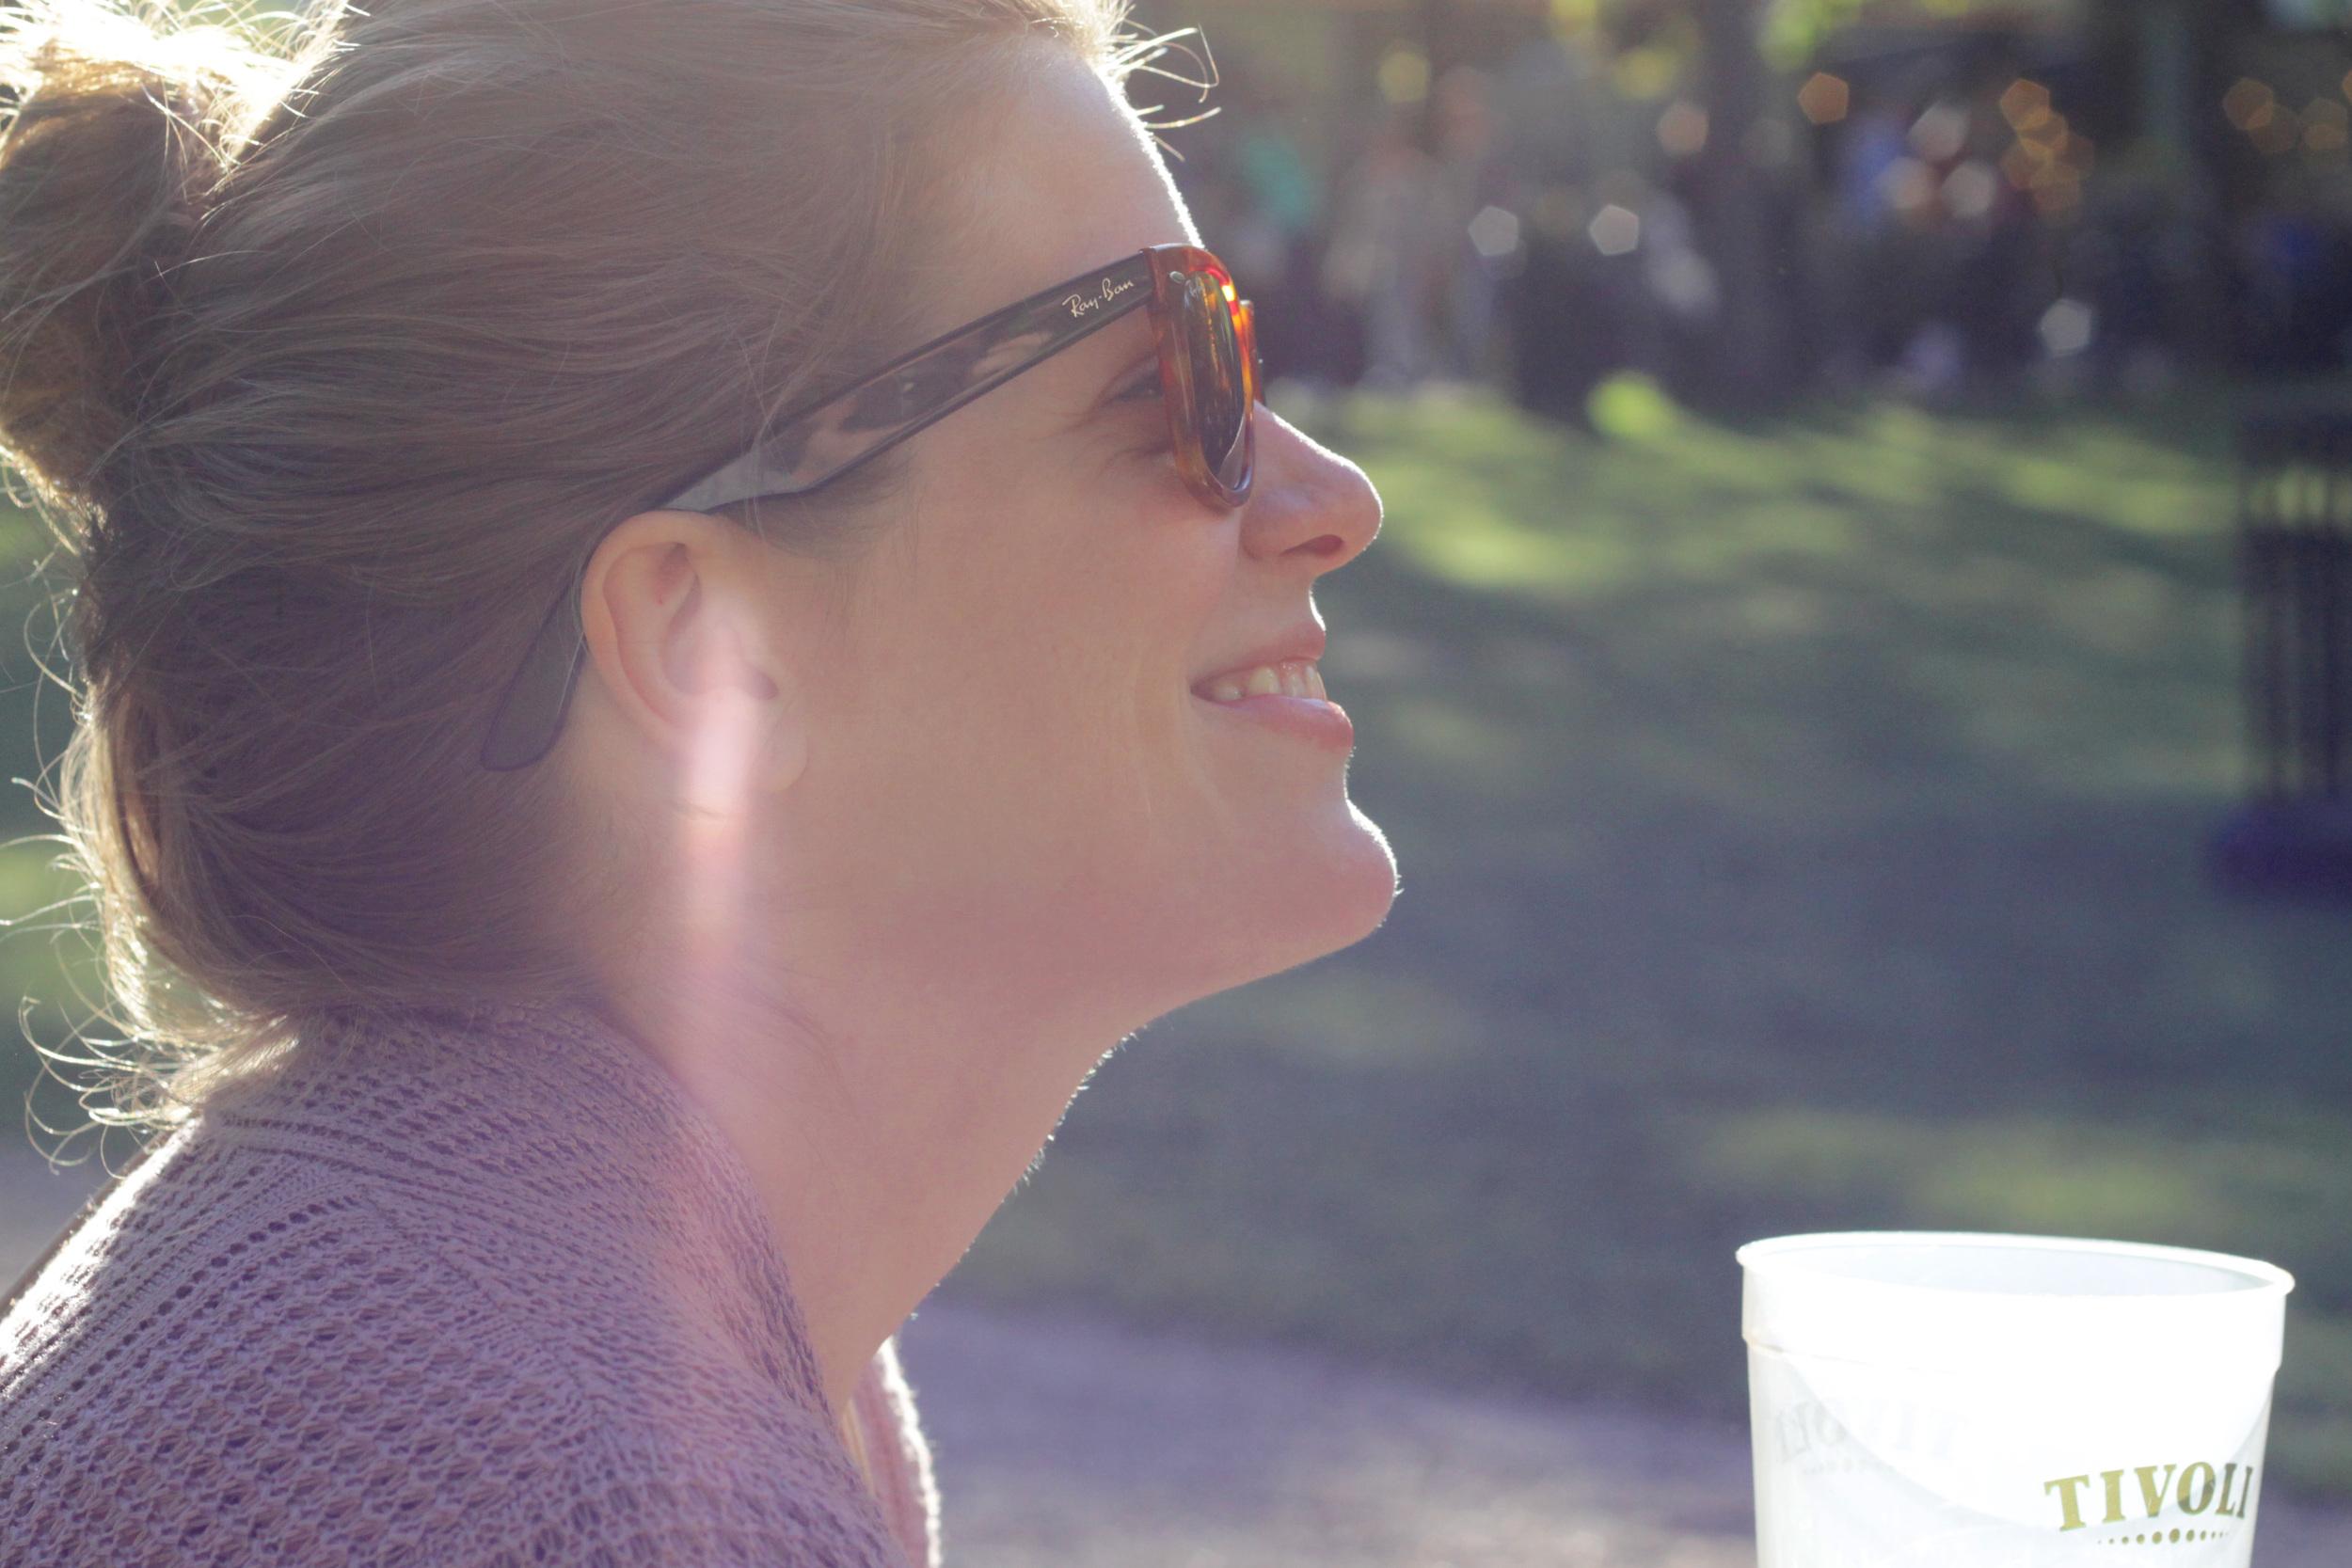 bekuh in tivoli gardens, copenhagen | via: bekuh b.